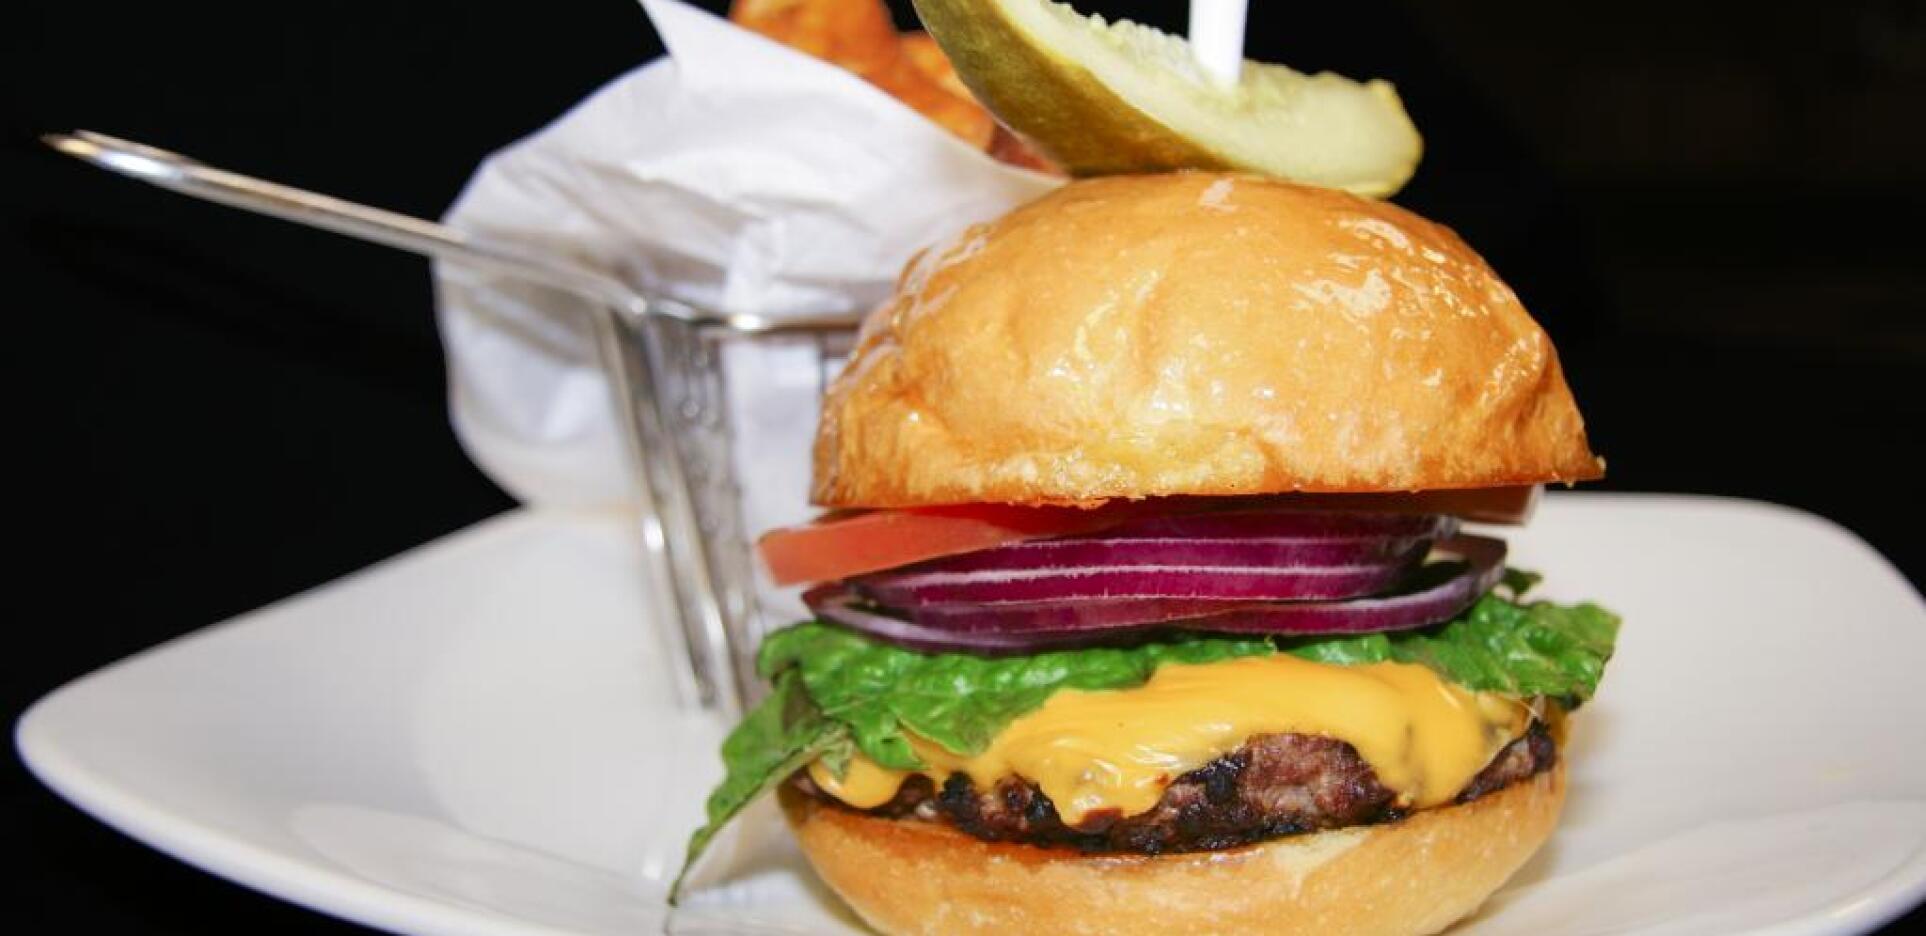 El Conquistador, Overlook Restaurant, Tucson Arizona, Burger